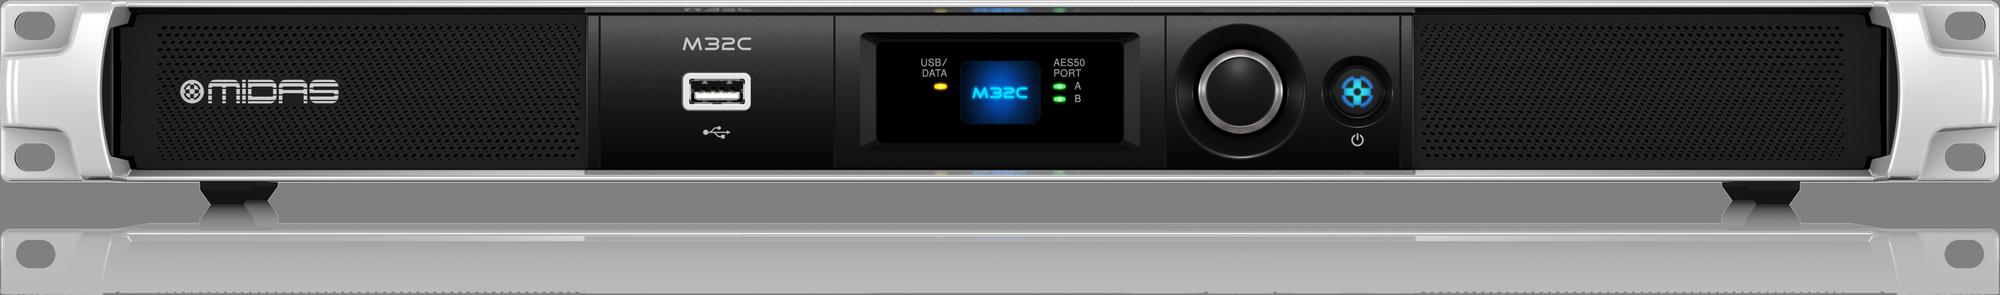 Midas M32C Midas Digital 1HE rack mixer multi functional